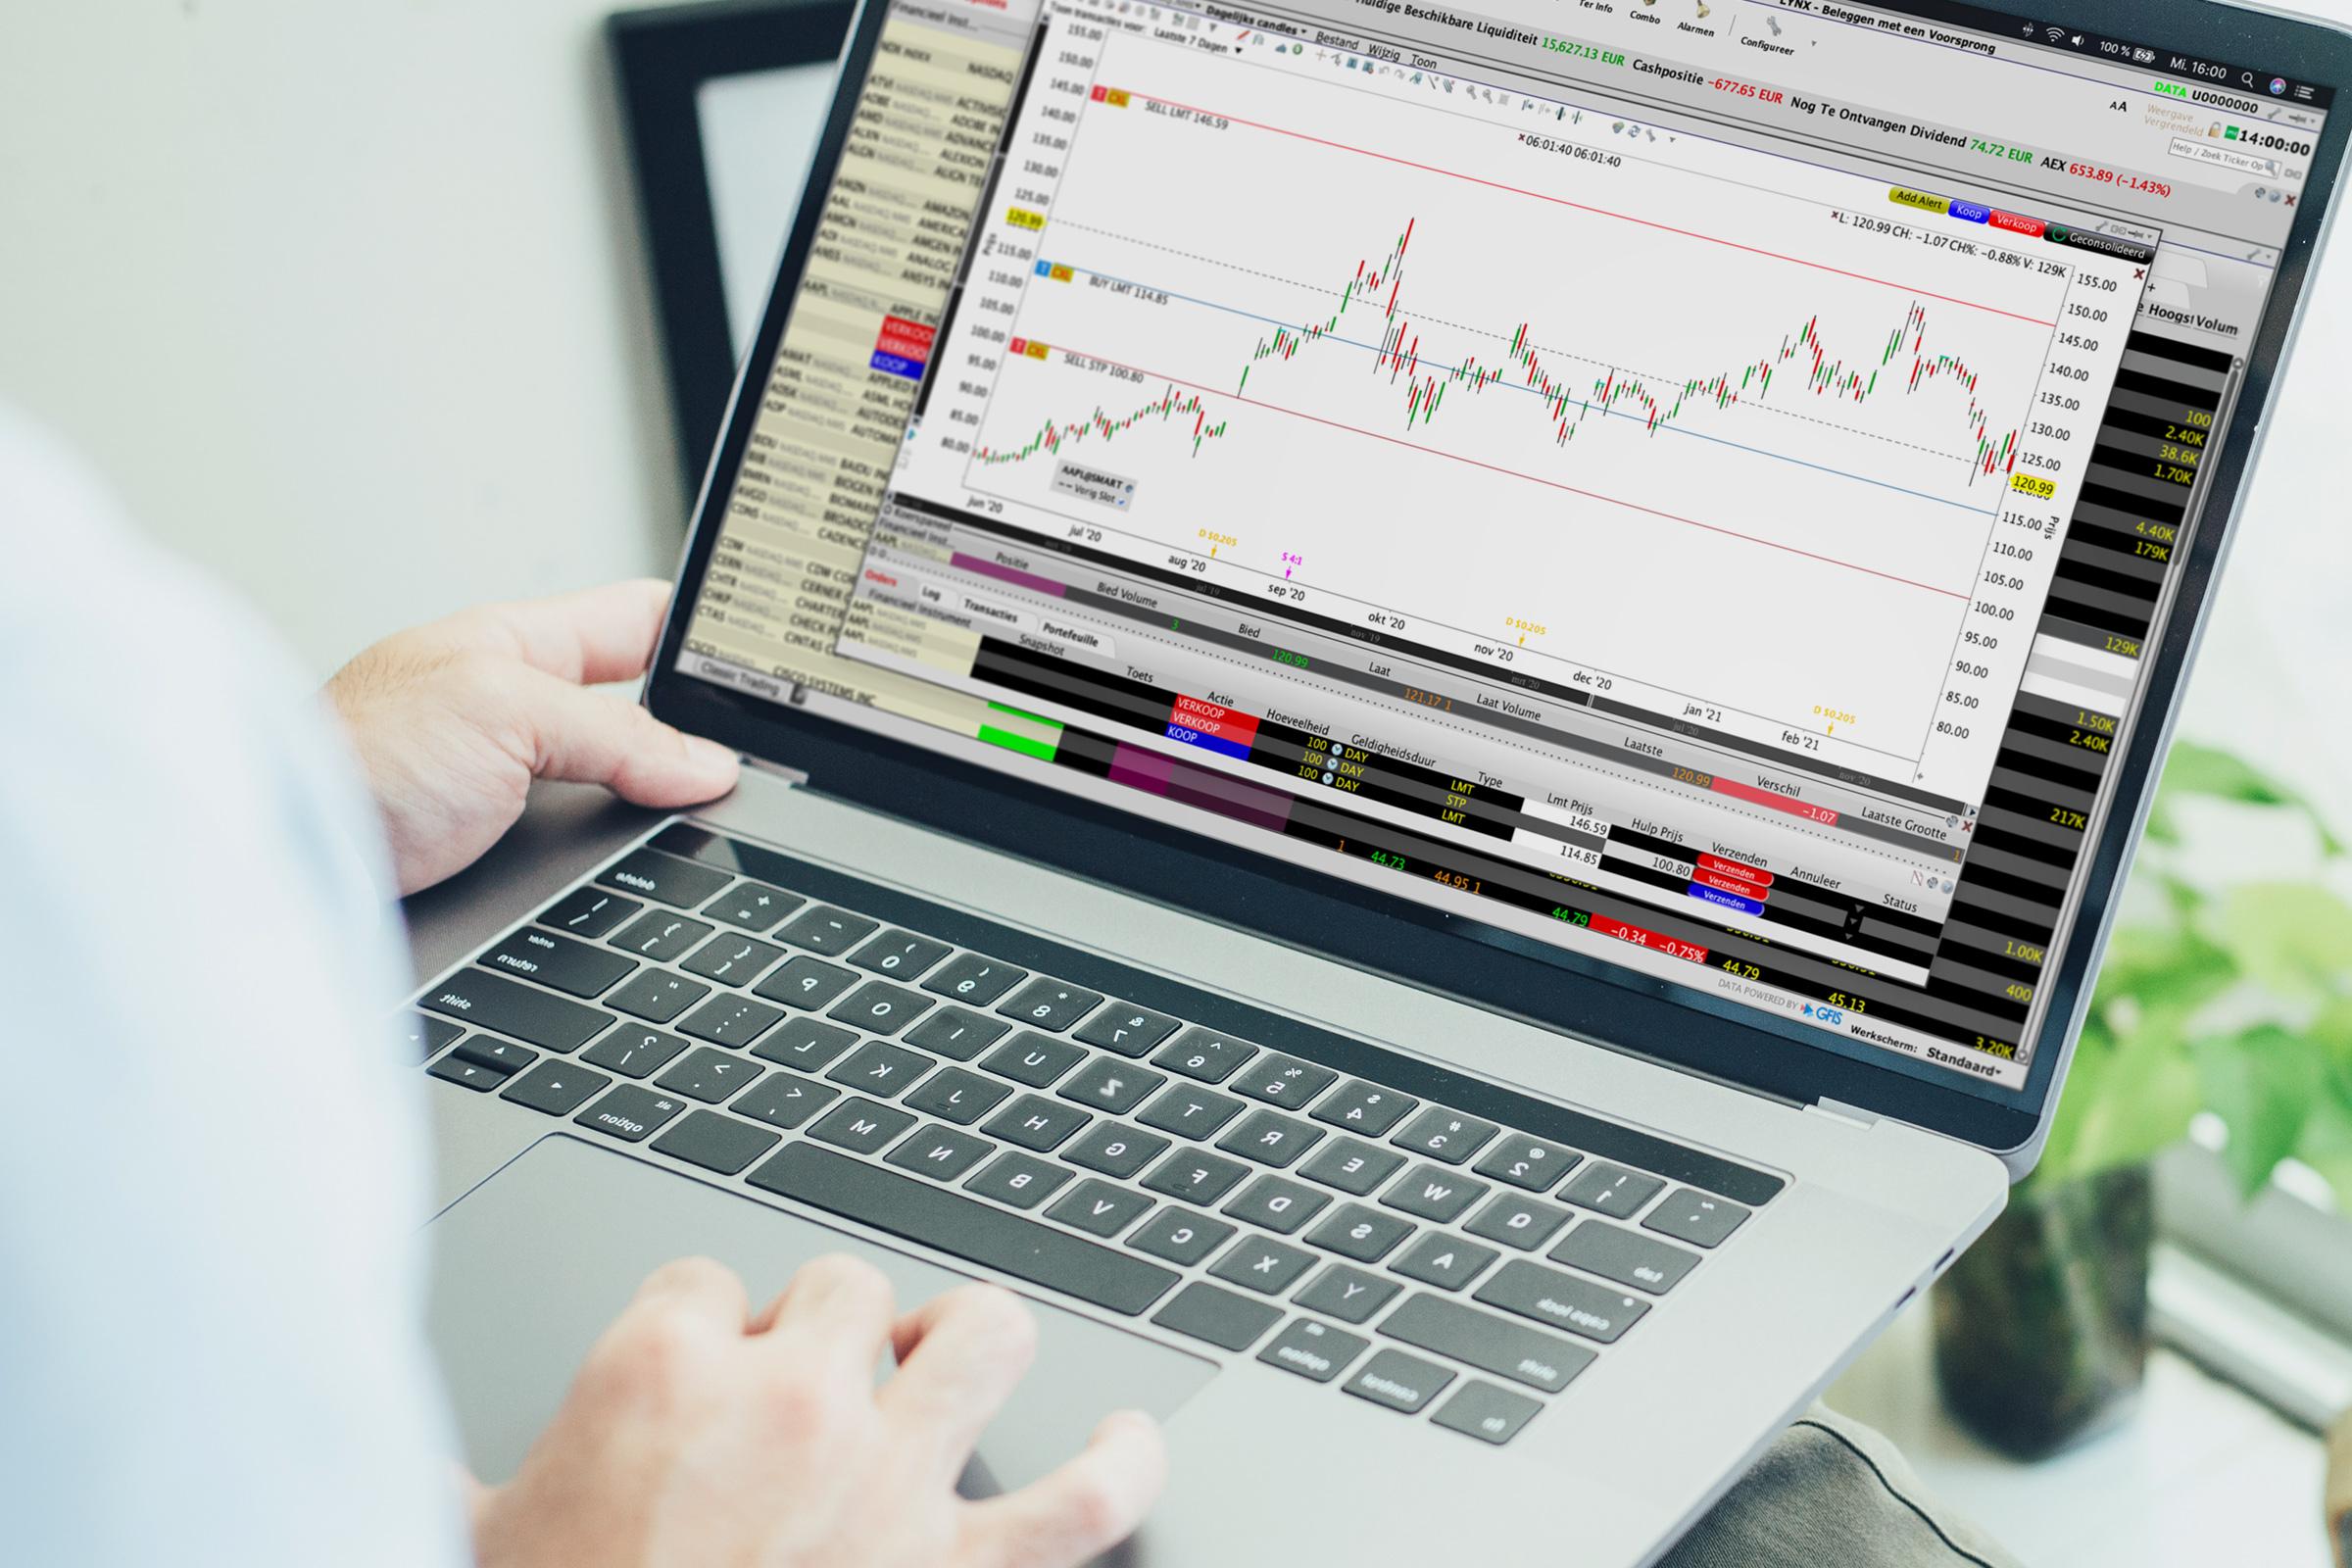 Uitgebreid handelsplatform - Beste broker